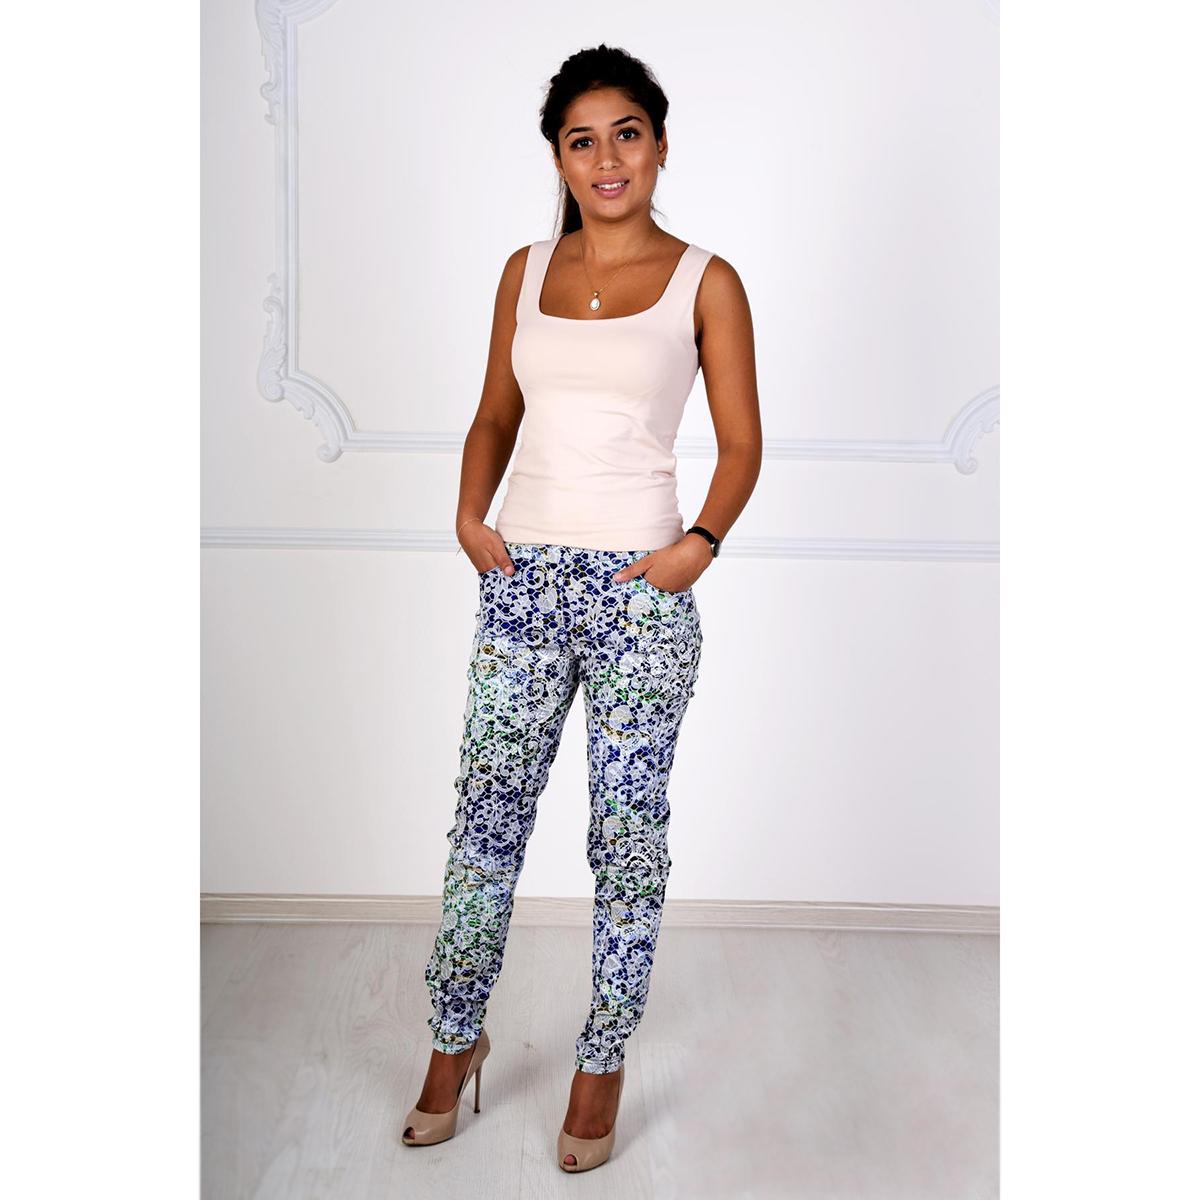 Женские брюки Жаккард арт. 0153, размер 48Шорты, бриджи, брюки<br>Обхват талии:78 см<br>Обхват бедер:104 см<br>Длина по внут. шву:73 см<br>Рост:167 см<br><br>Тип: Жен. брюки<br>Размер: 48<br>Материал: Жаккард